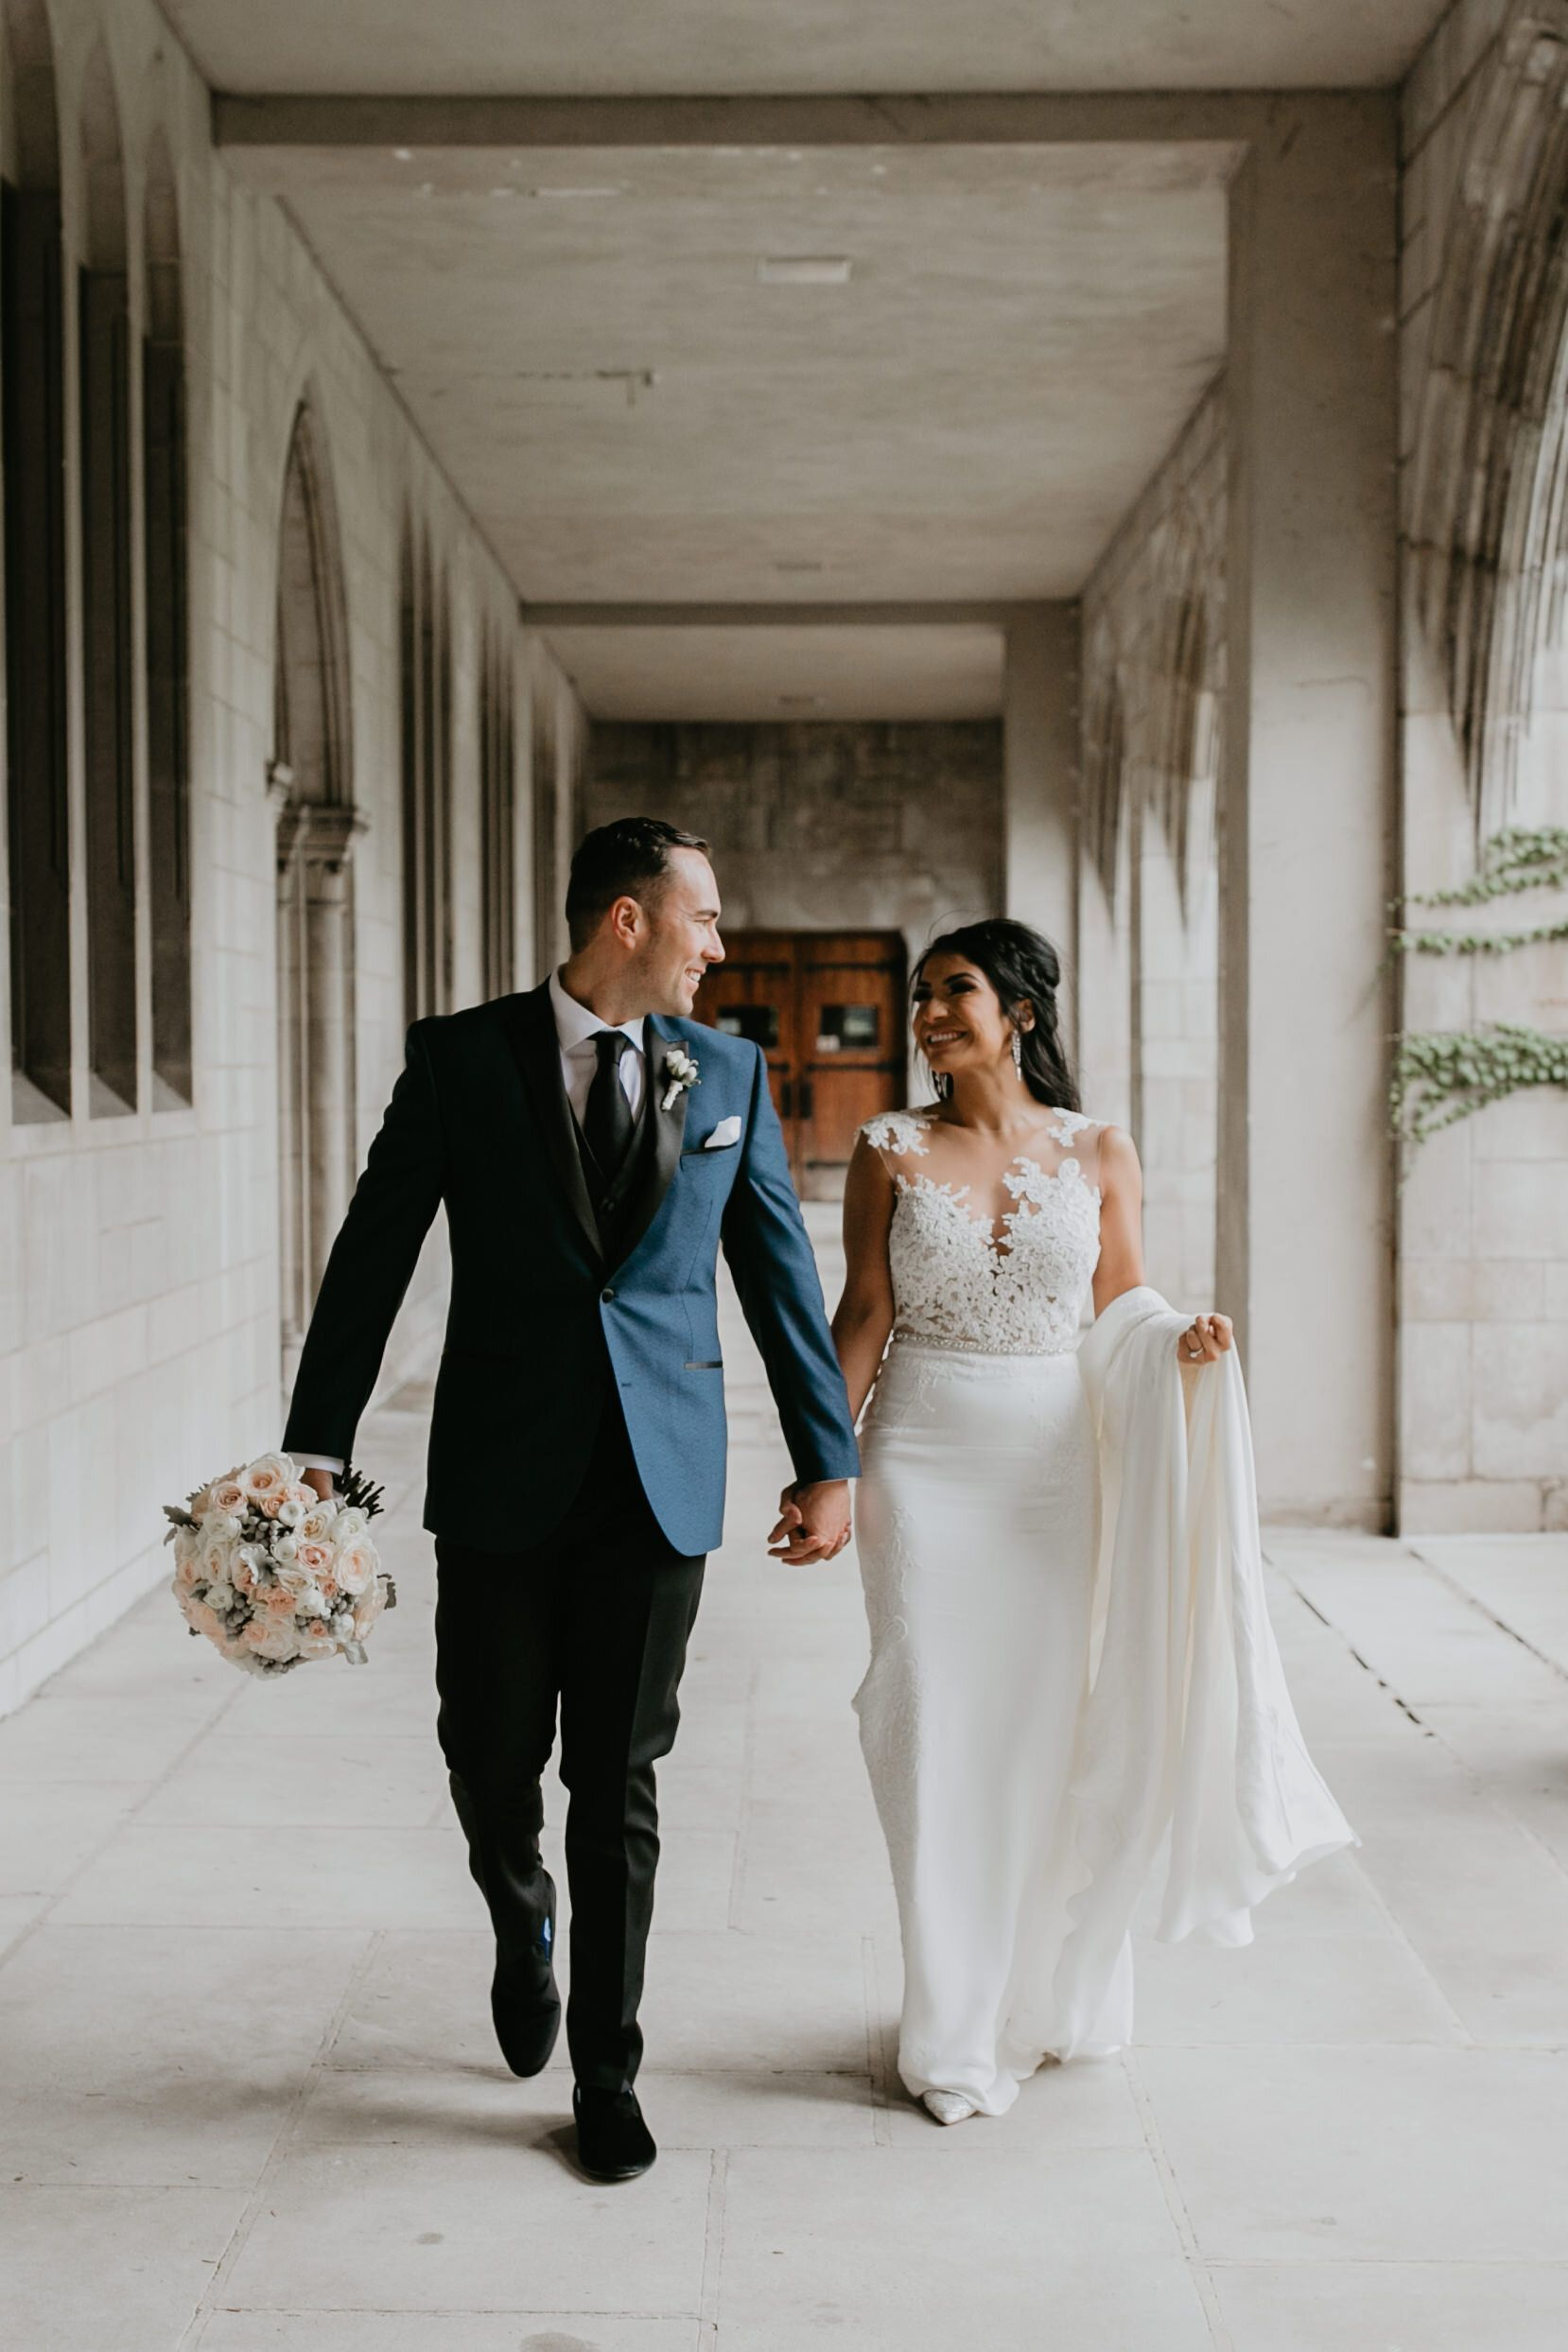 Theresa Brad River Forest Illinois Wedding Ben Ramos Photography In 2020 Chicago Suburbs Wedding Wedding Photography Company Chicago Wedding